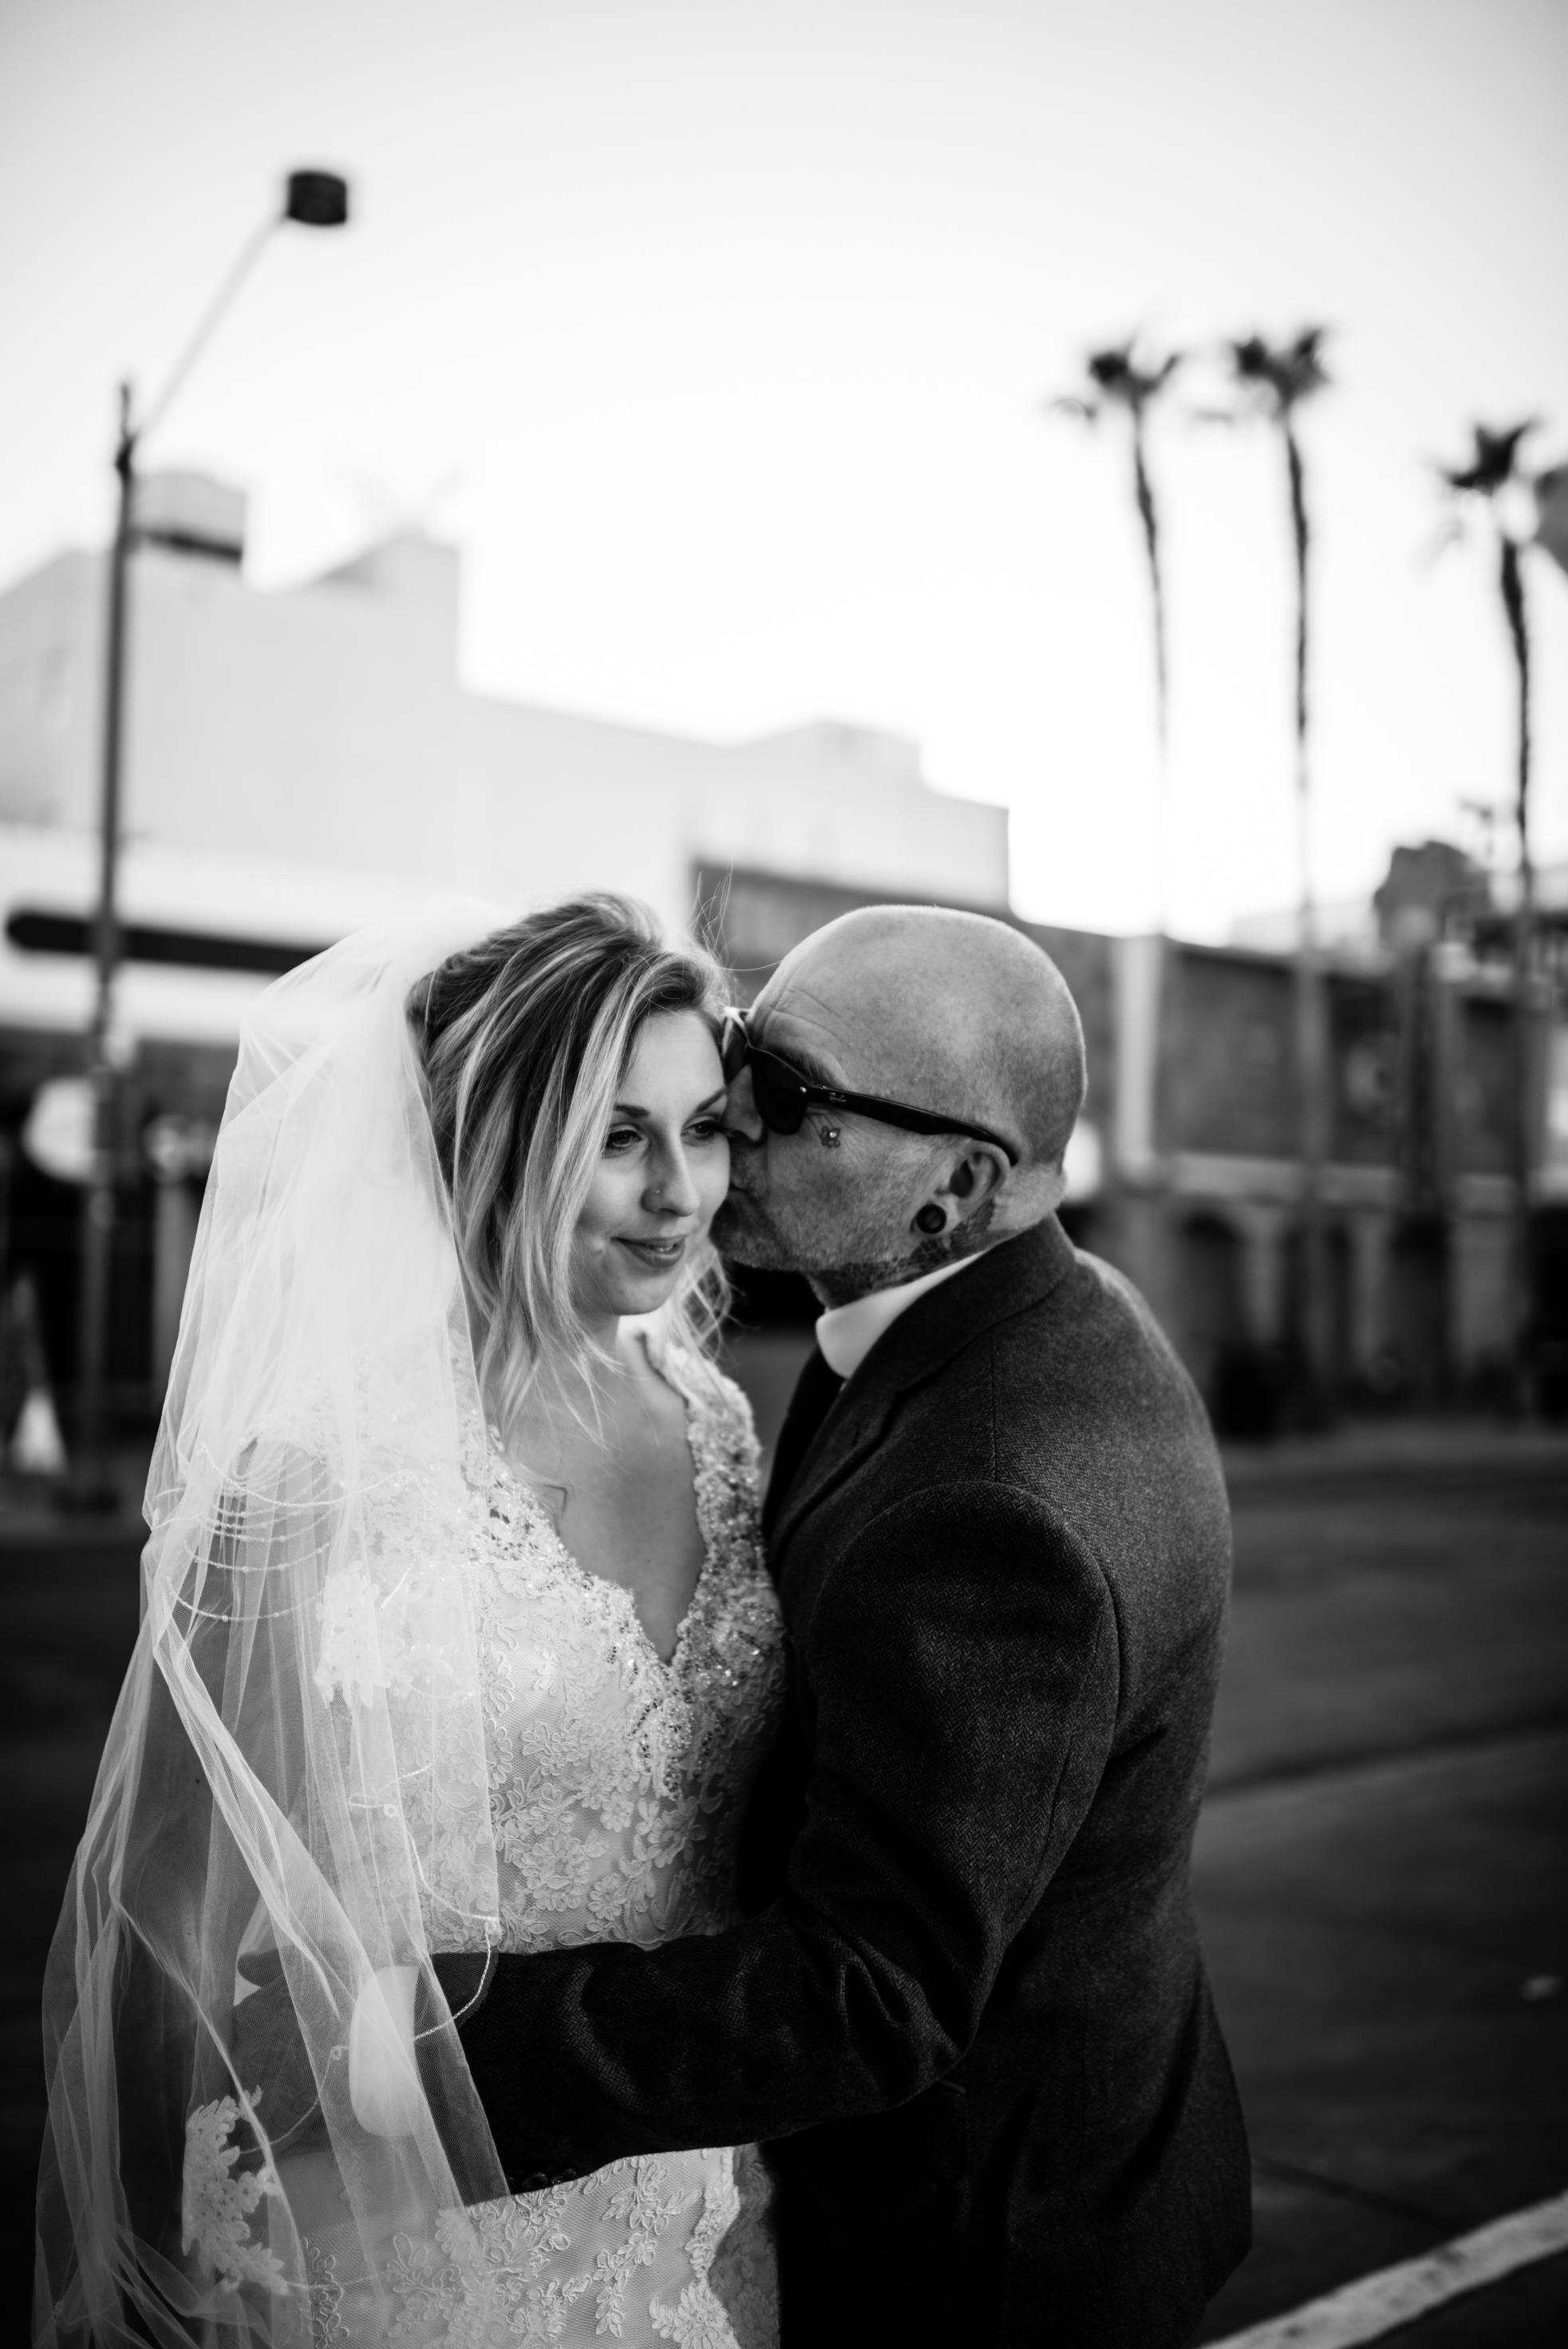 Las Vegas Elopement Photographer Ashley Marie Myers Rock'n Roll Bride-117.jpg